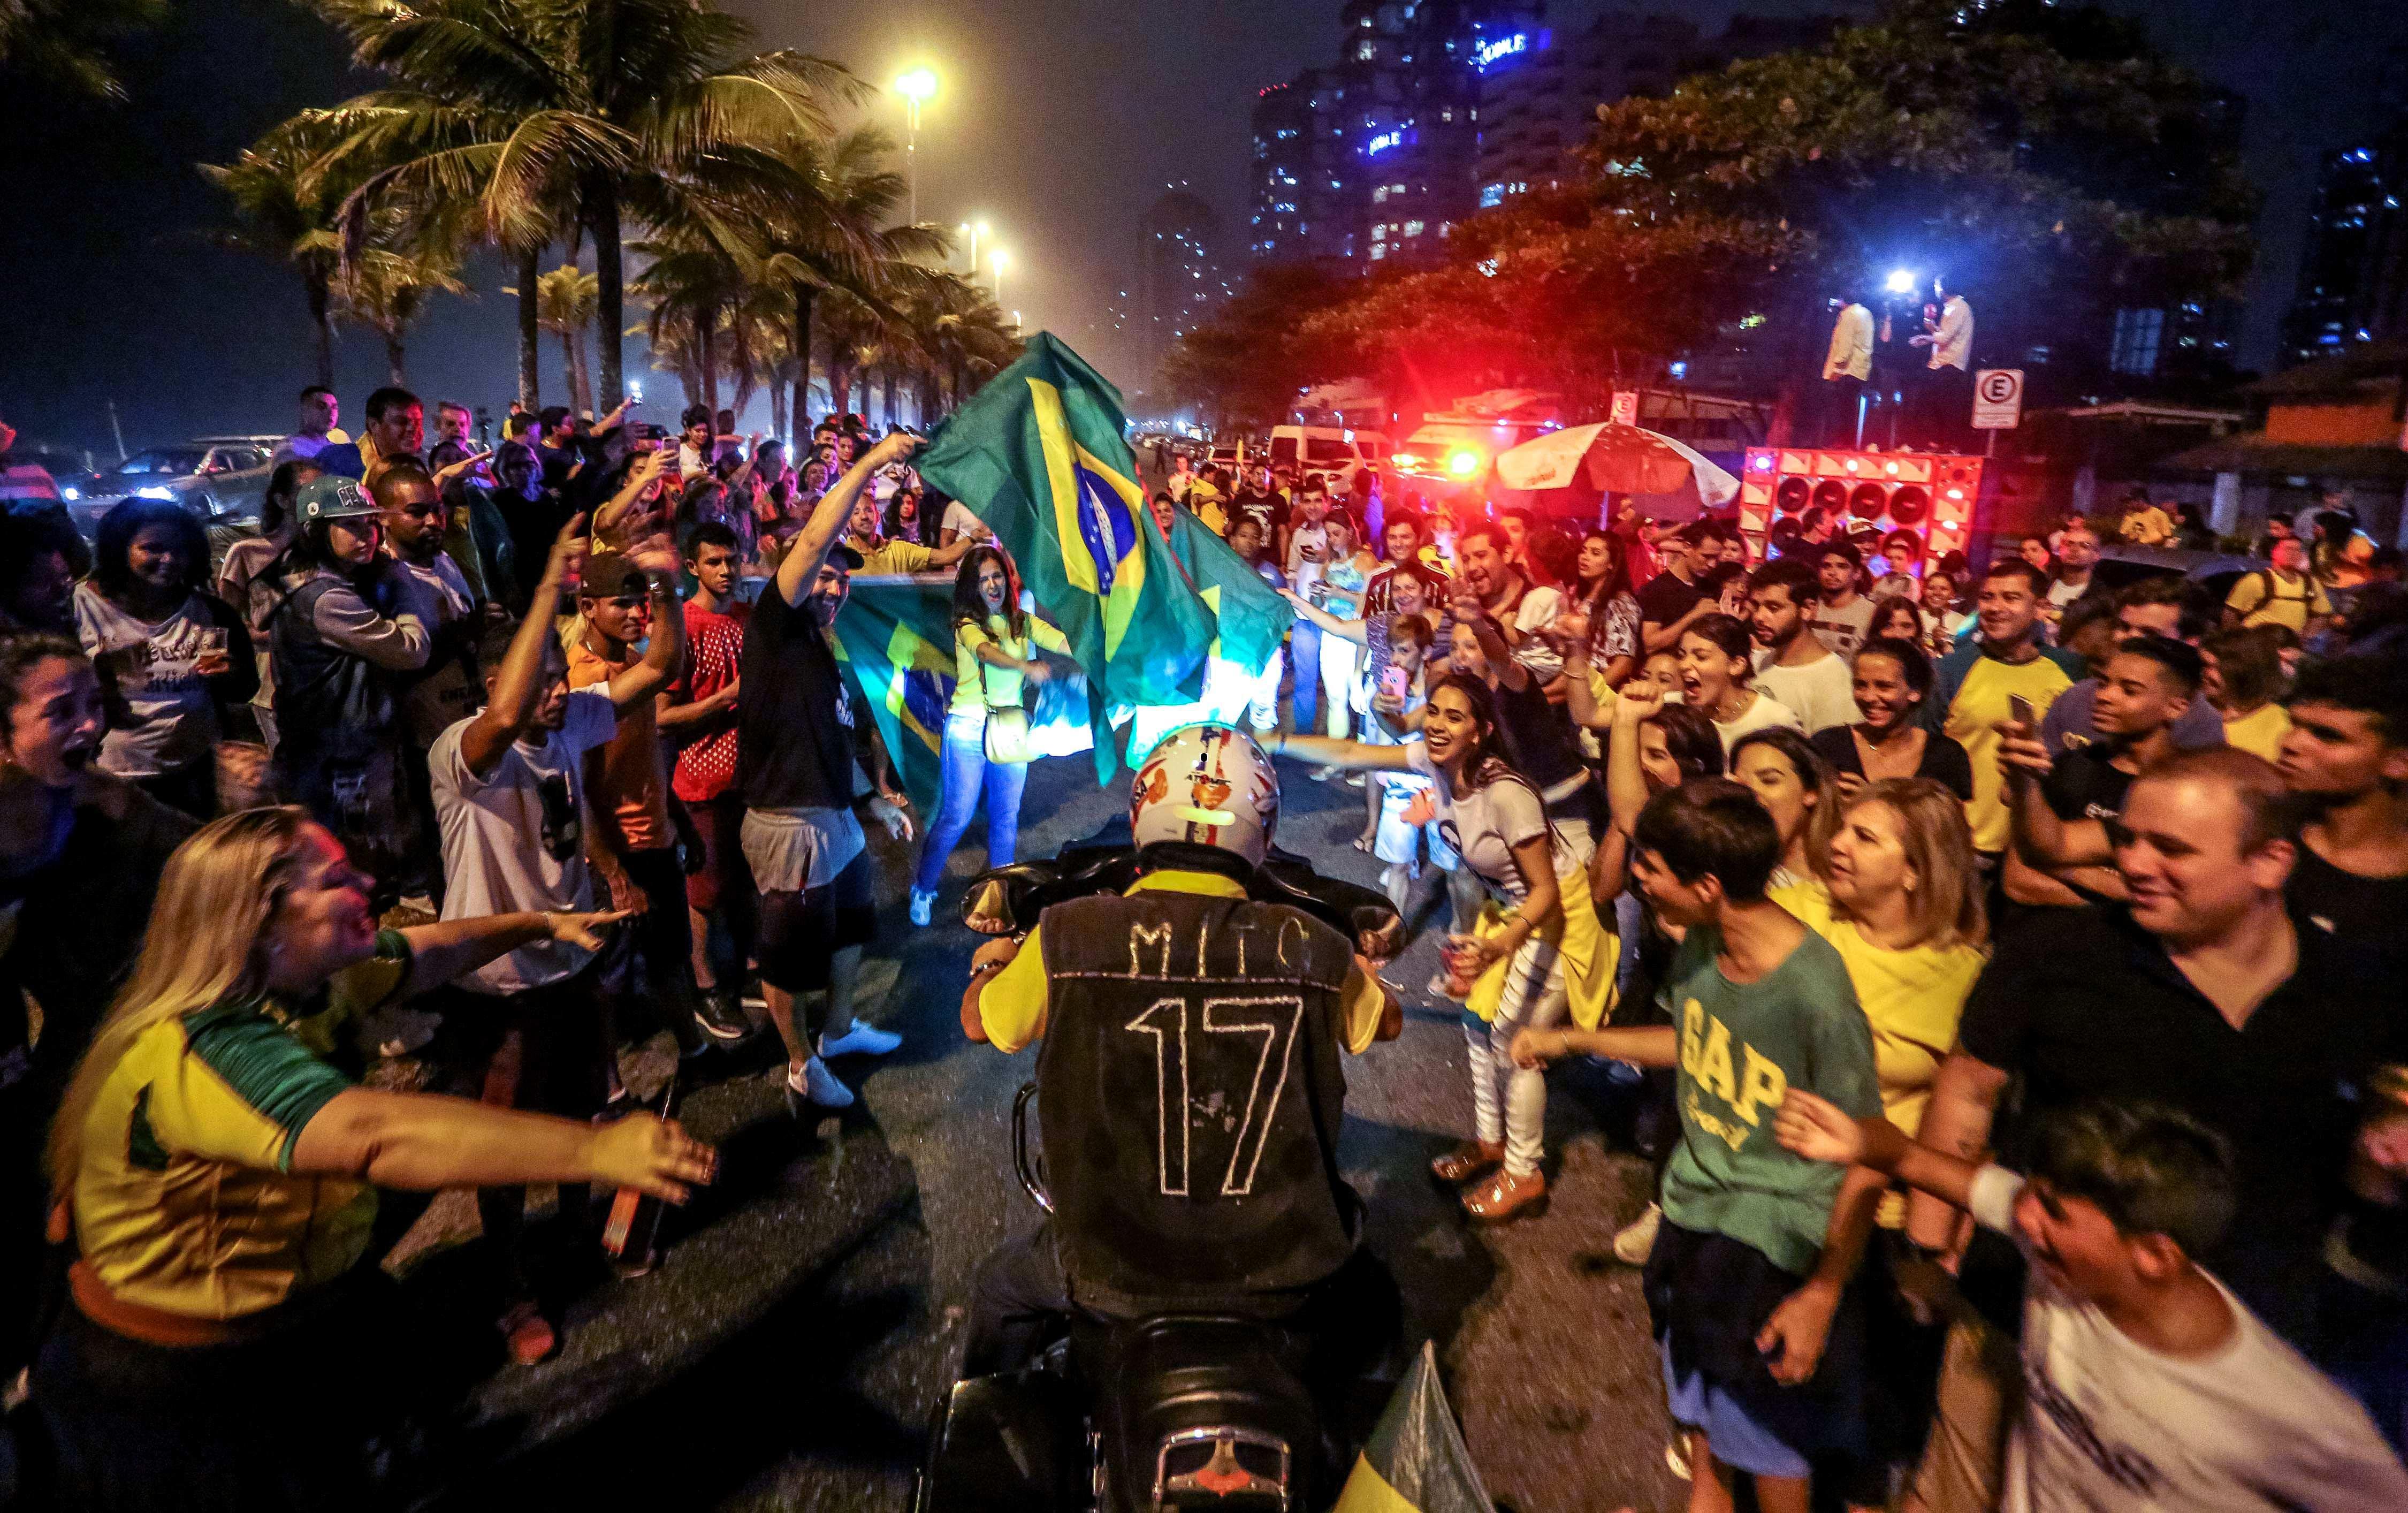 Encuestas confirman a Bolsonaro como gran favorito para segunda vuelta en Brasil